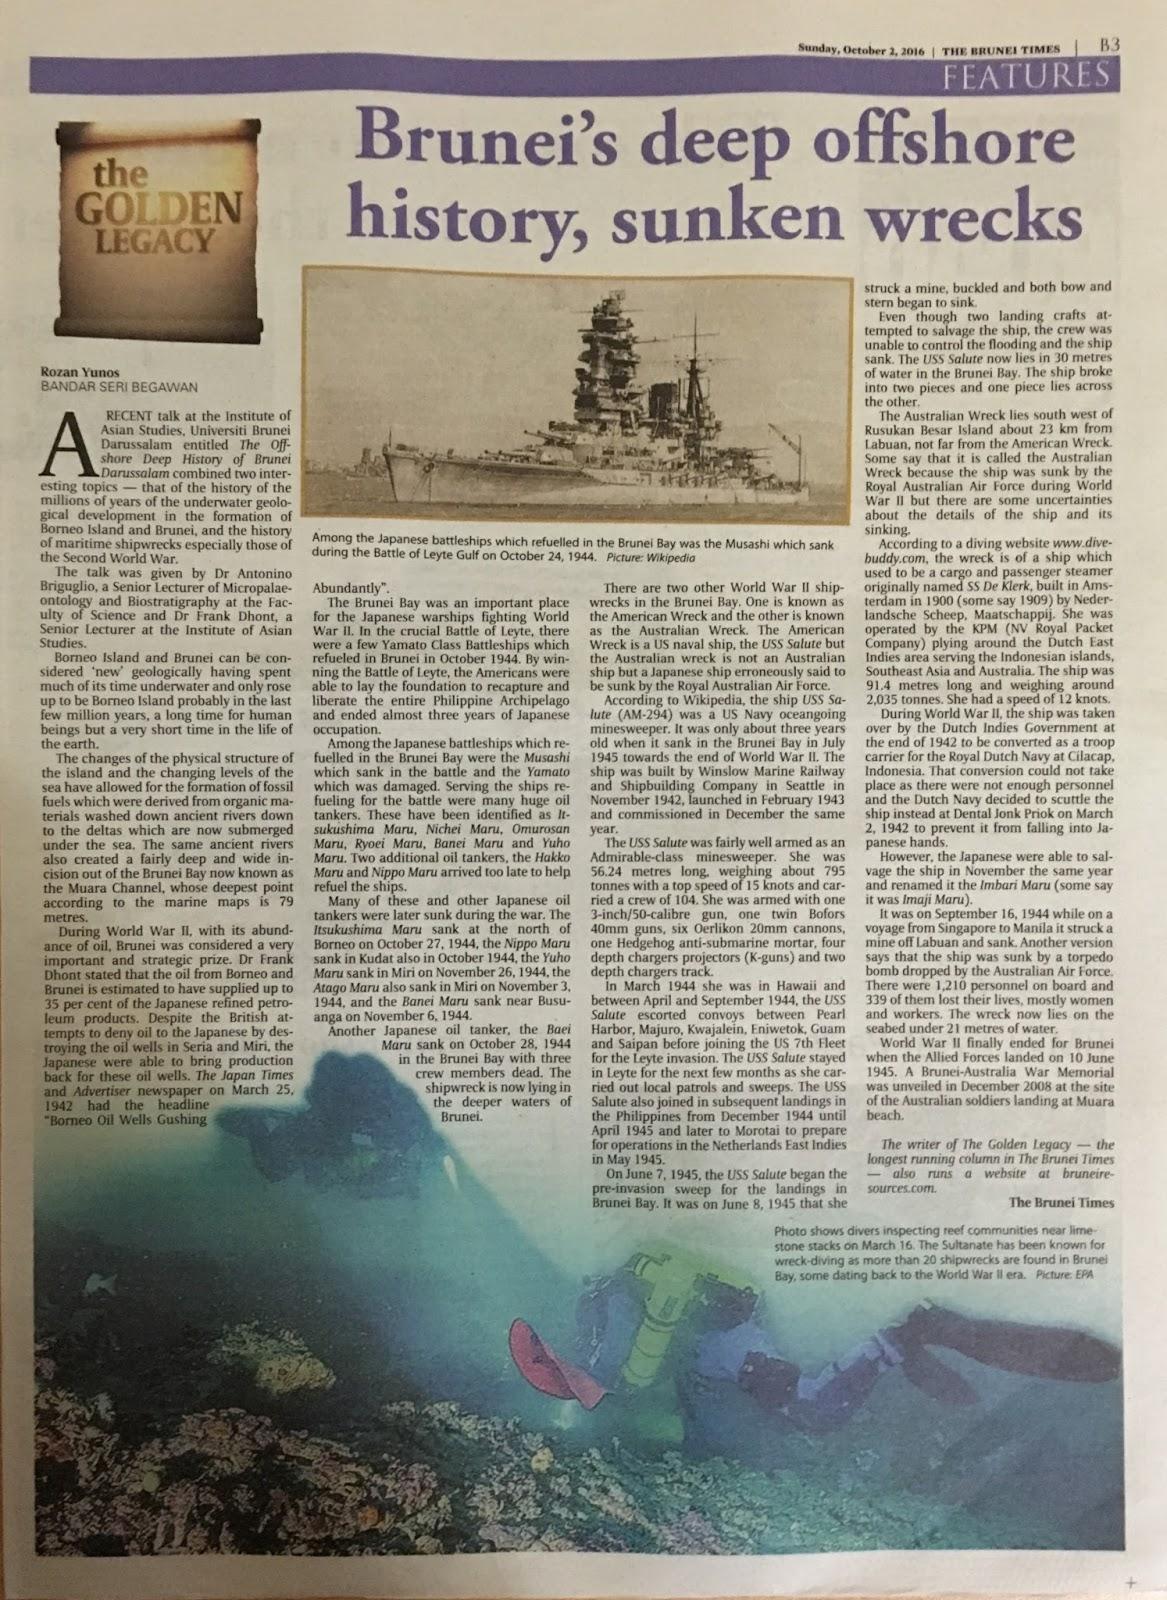 Brunei's Deep Offshore History, Sunken Wrecks